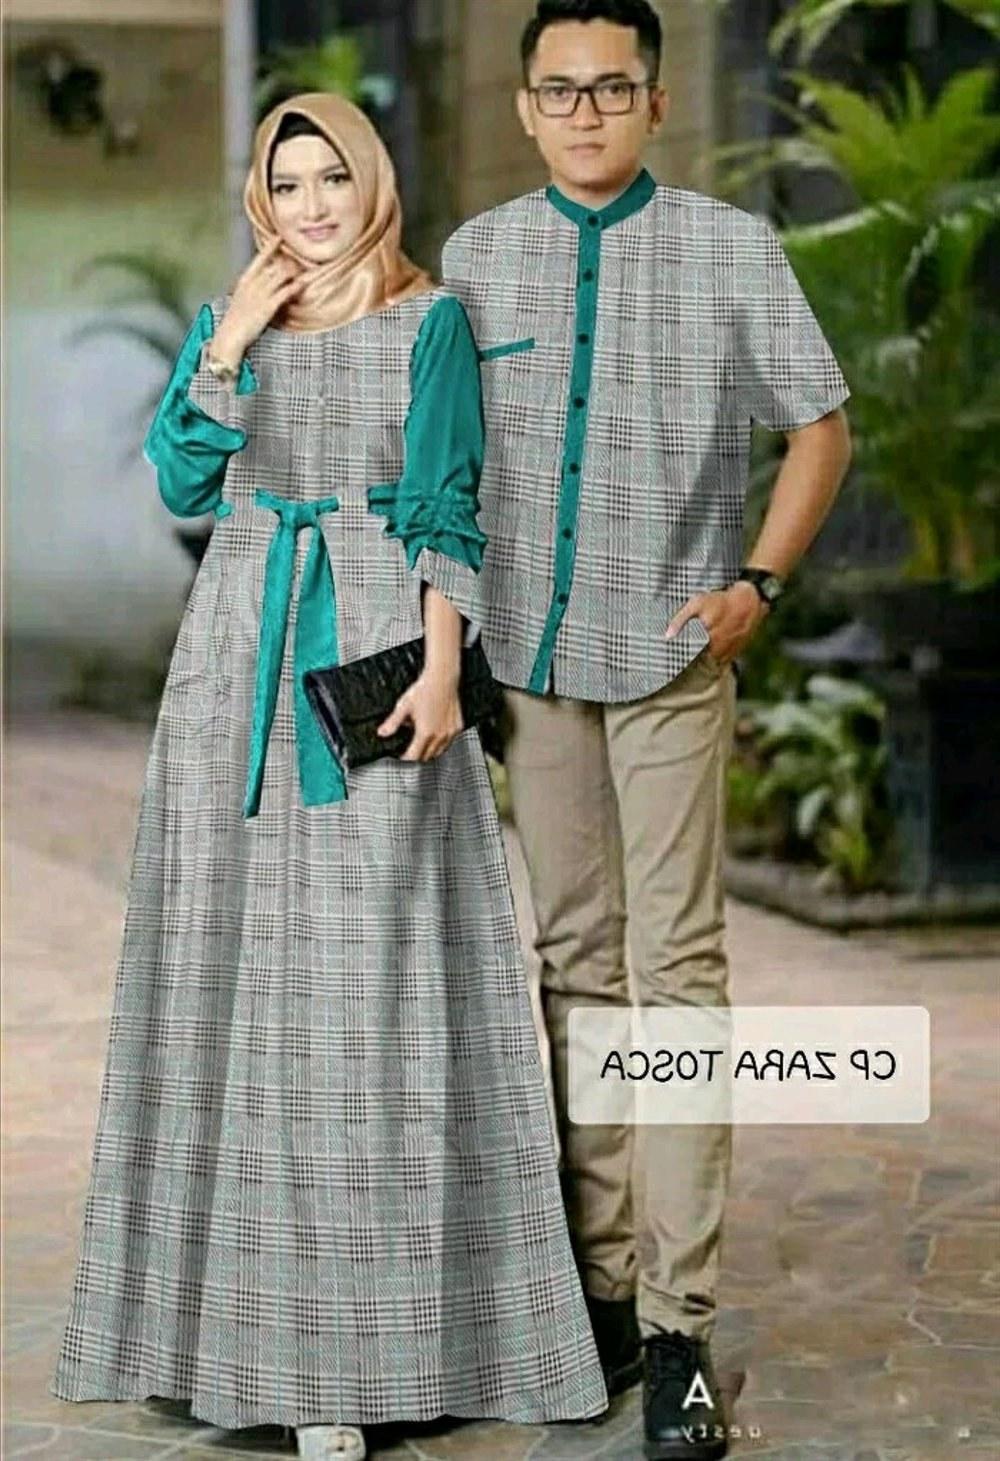 Bentuk Baju Lebaran Kapel Fmdf Jual Baju Pasangan Modern Baju Couple Pesta Kondangan